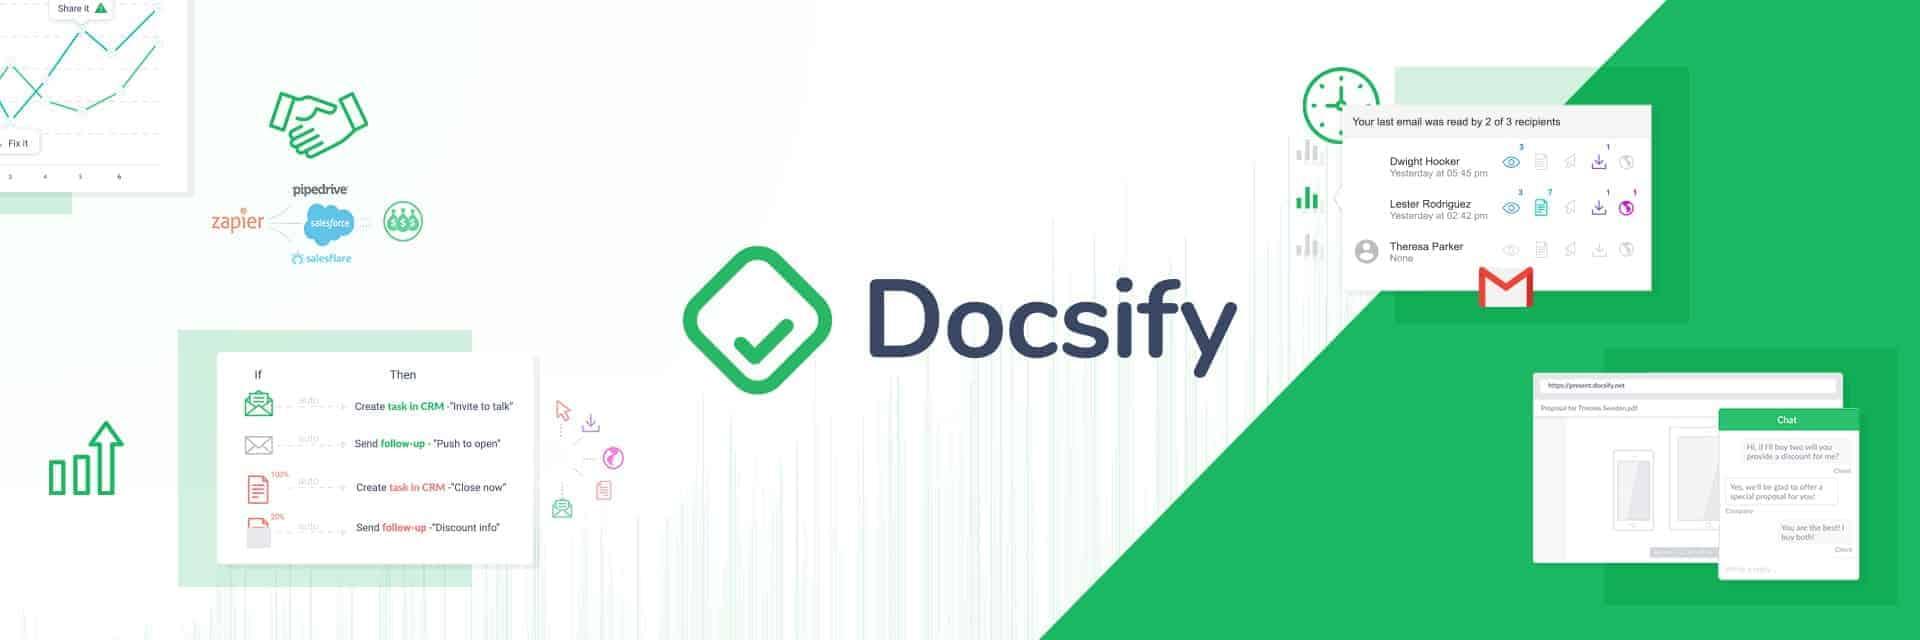 docsify-banner